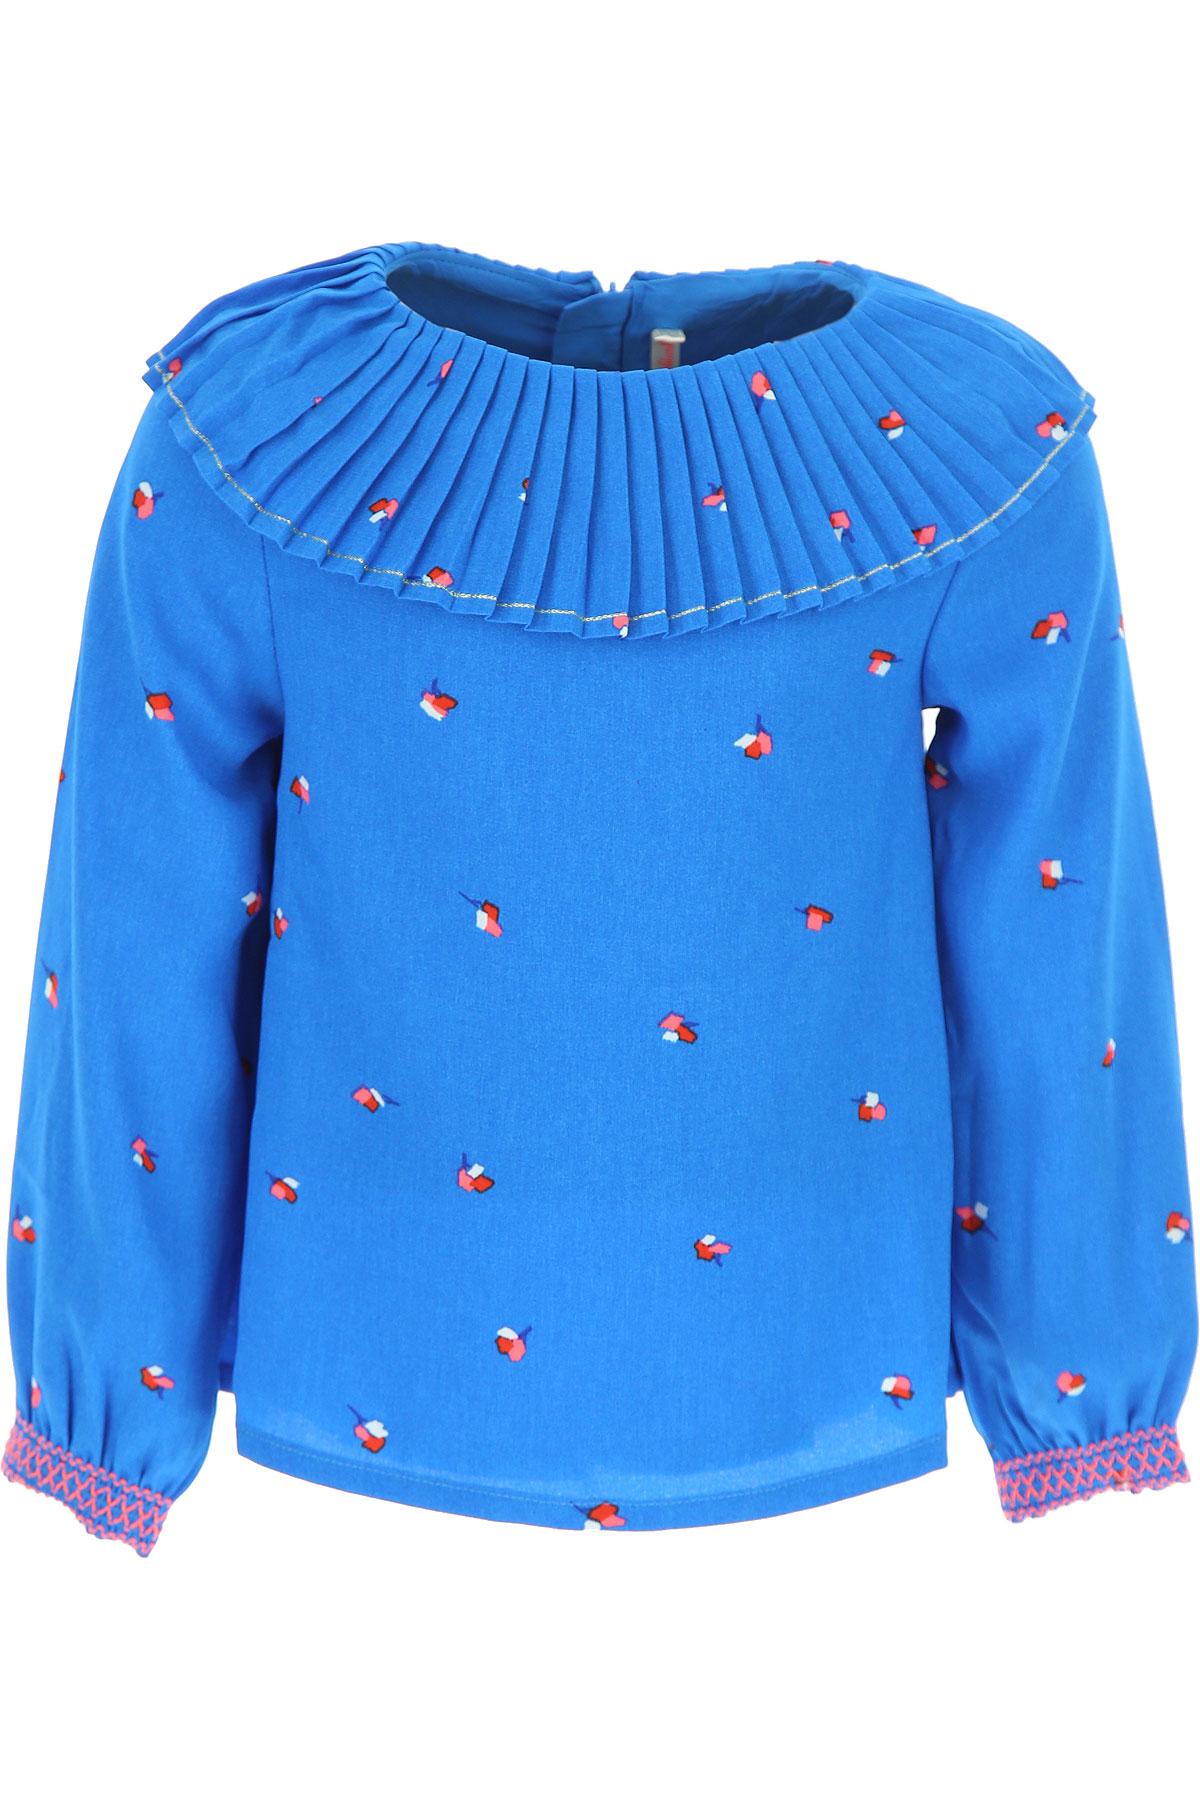 Billieblush Chemises Enfant pour Fille Pas cher en Soldes, Bleu, Polyester, 2017, 10Y 2Y 3Y 4Y 6Y 8Y